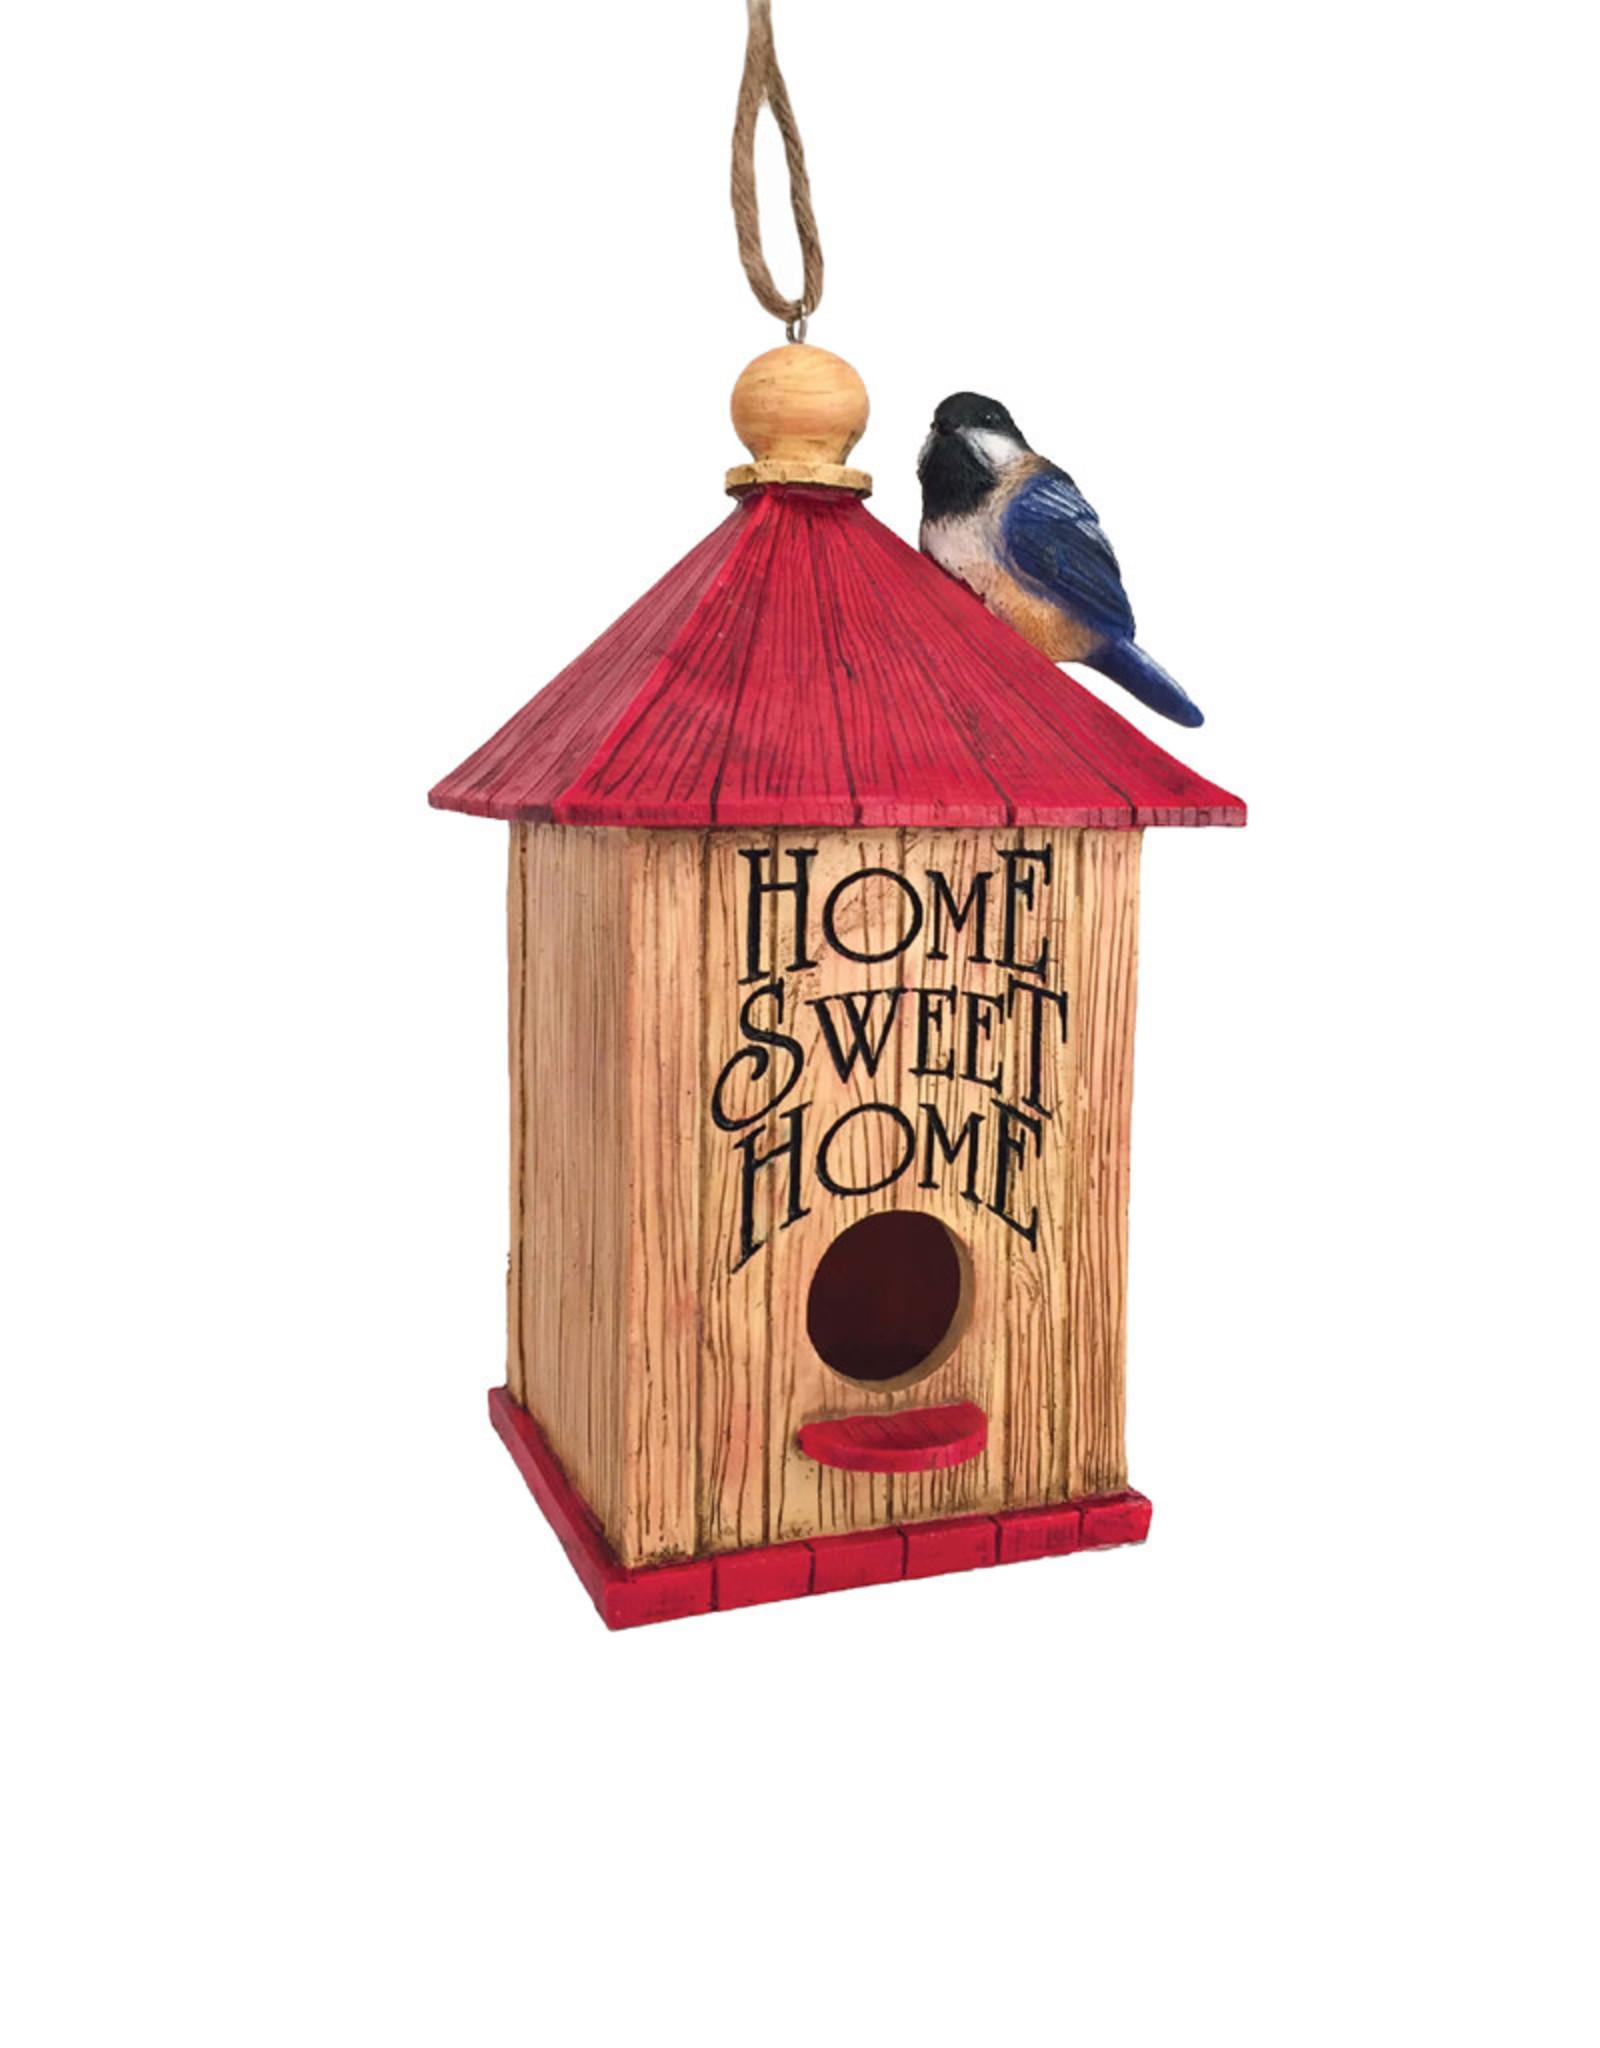 Home Sweet Home ( Birdhouse )